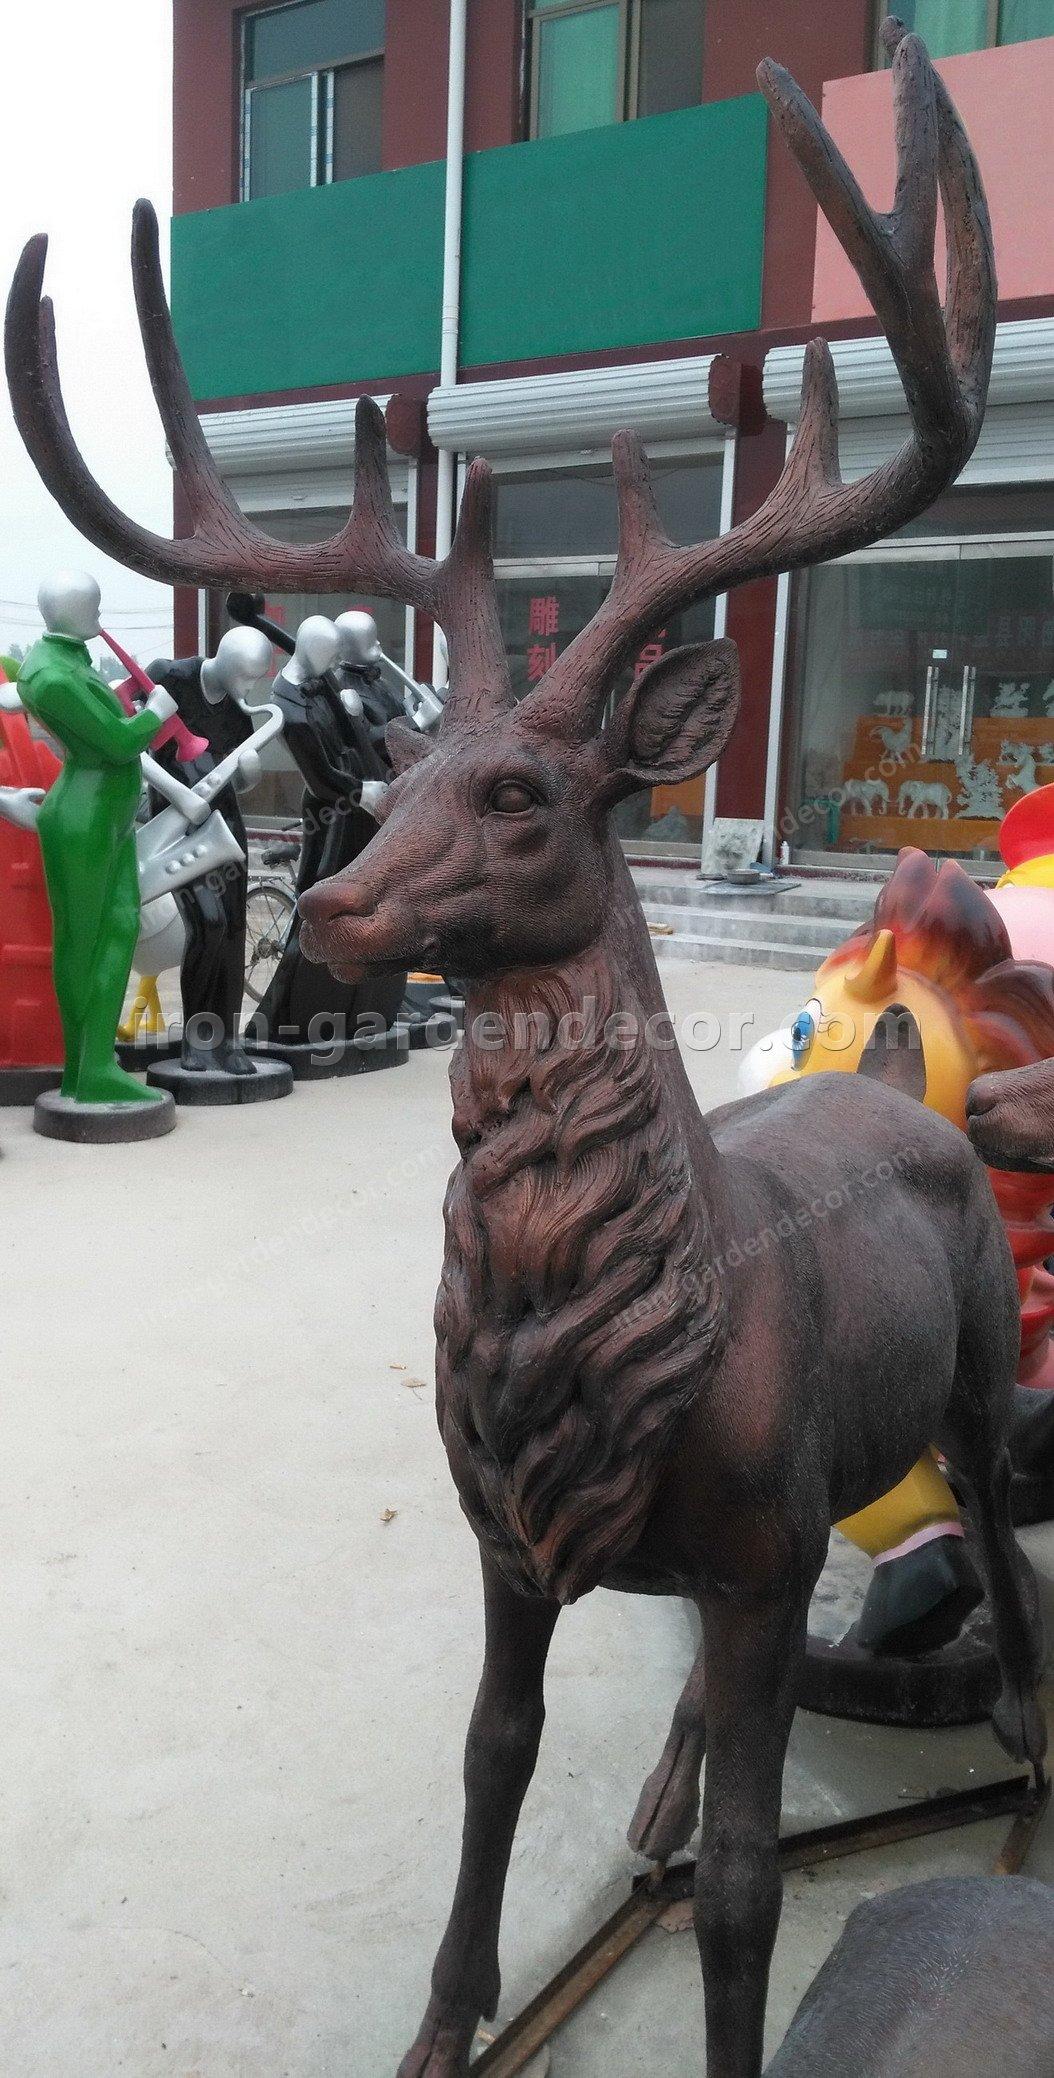 Home decoration outdoor garden stage animal resin statue fiberglass-DEER FAMILY FS076 (3)